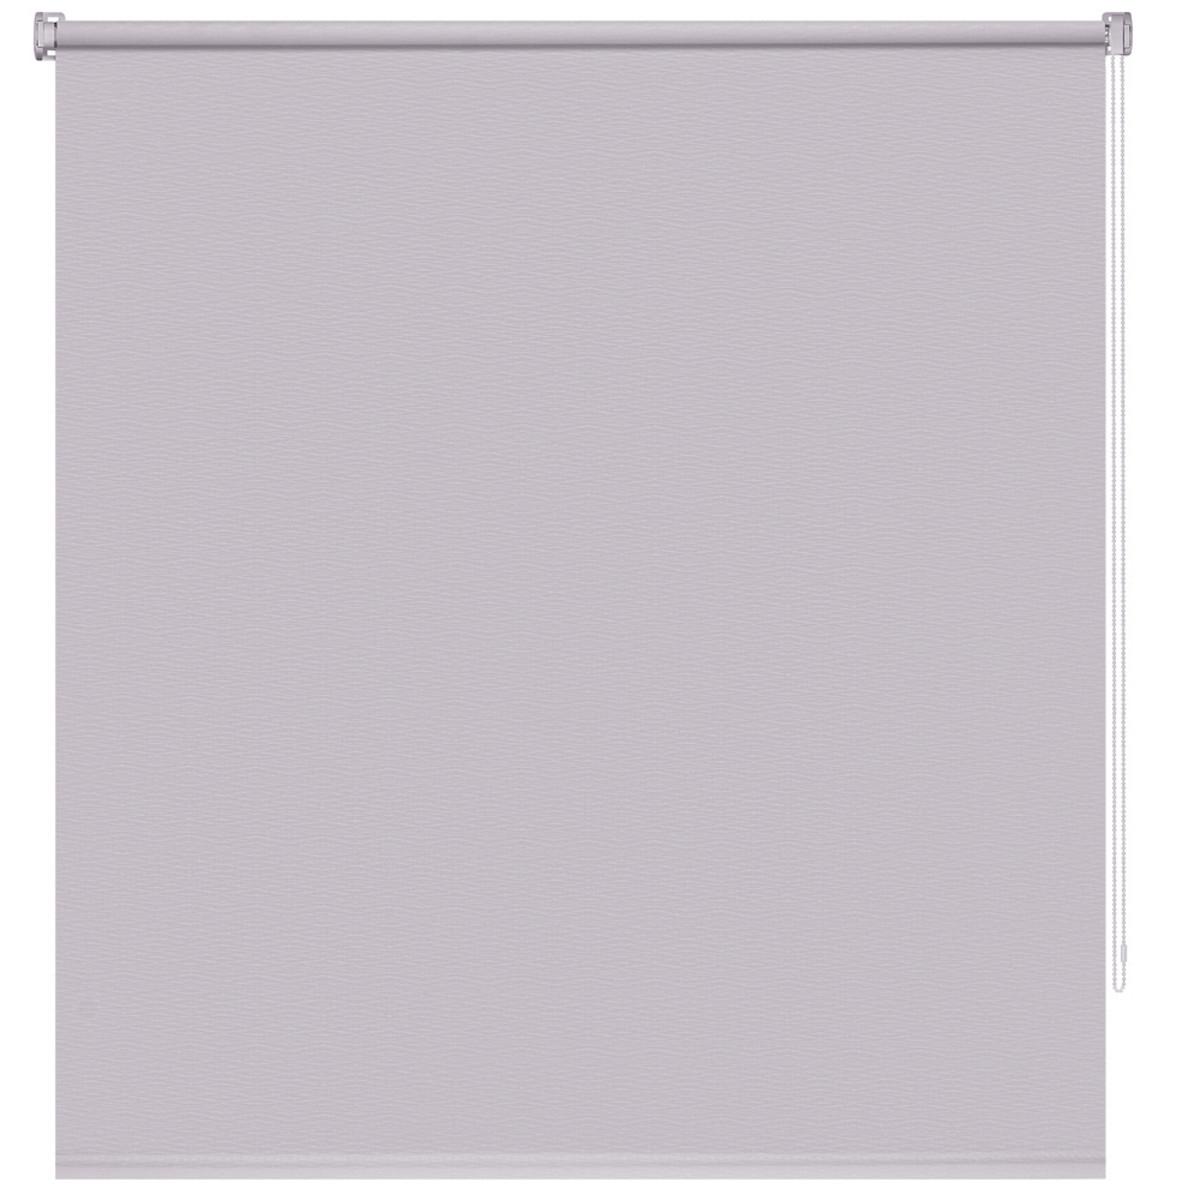 Рулонная Ора Decofest Маринела 160Х175 Цвет Серый